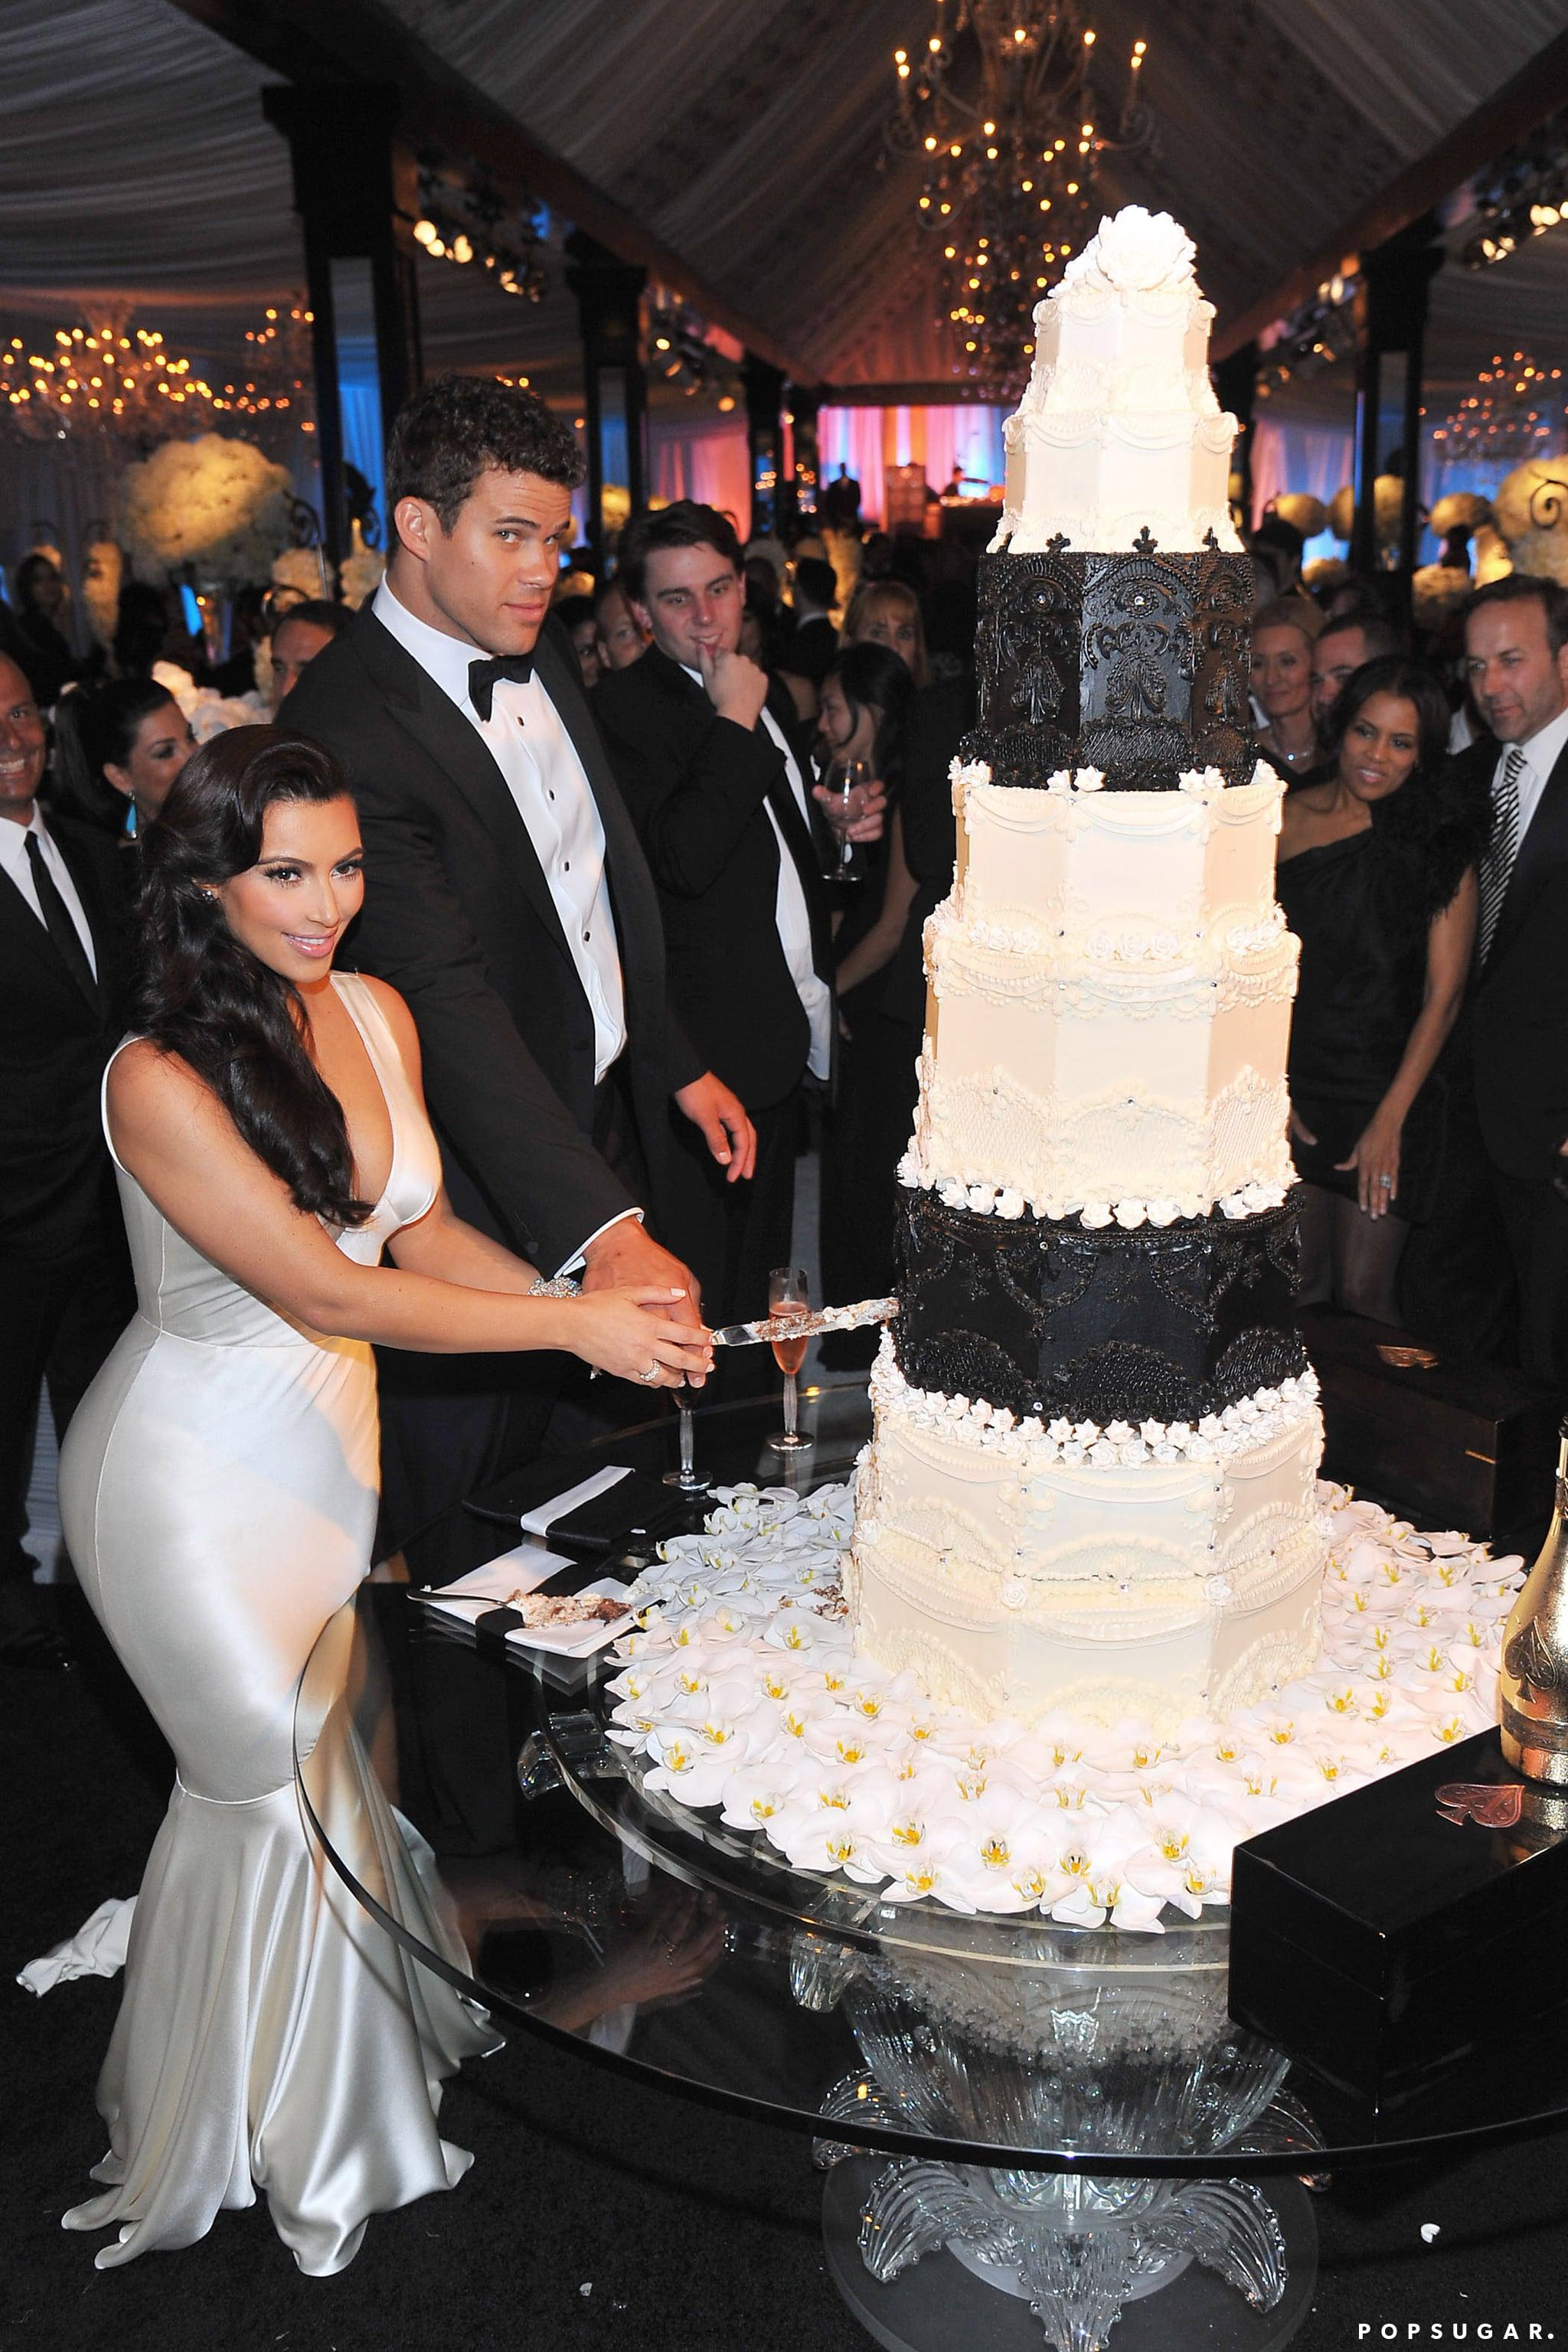 Kim Kardashian Wedding Pictures With Kris Humphries Popsugar Celebrity